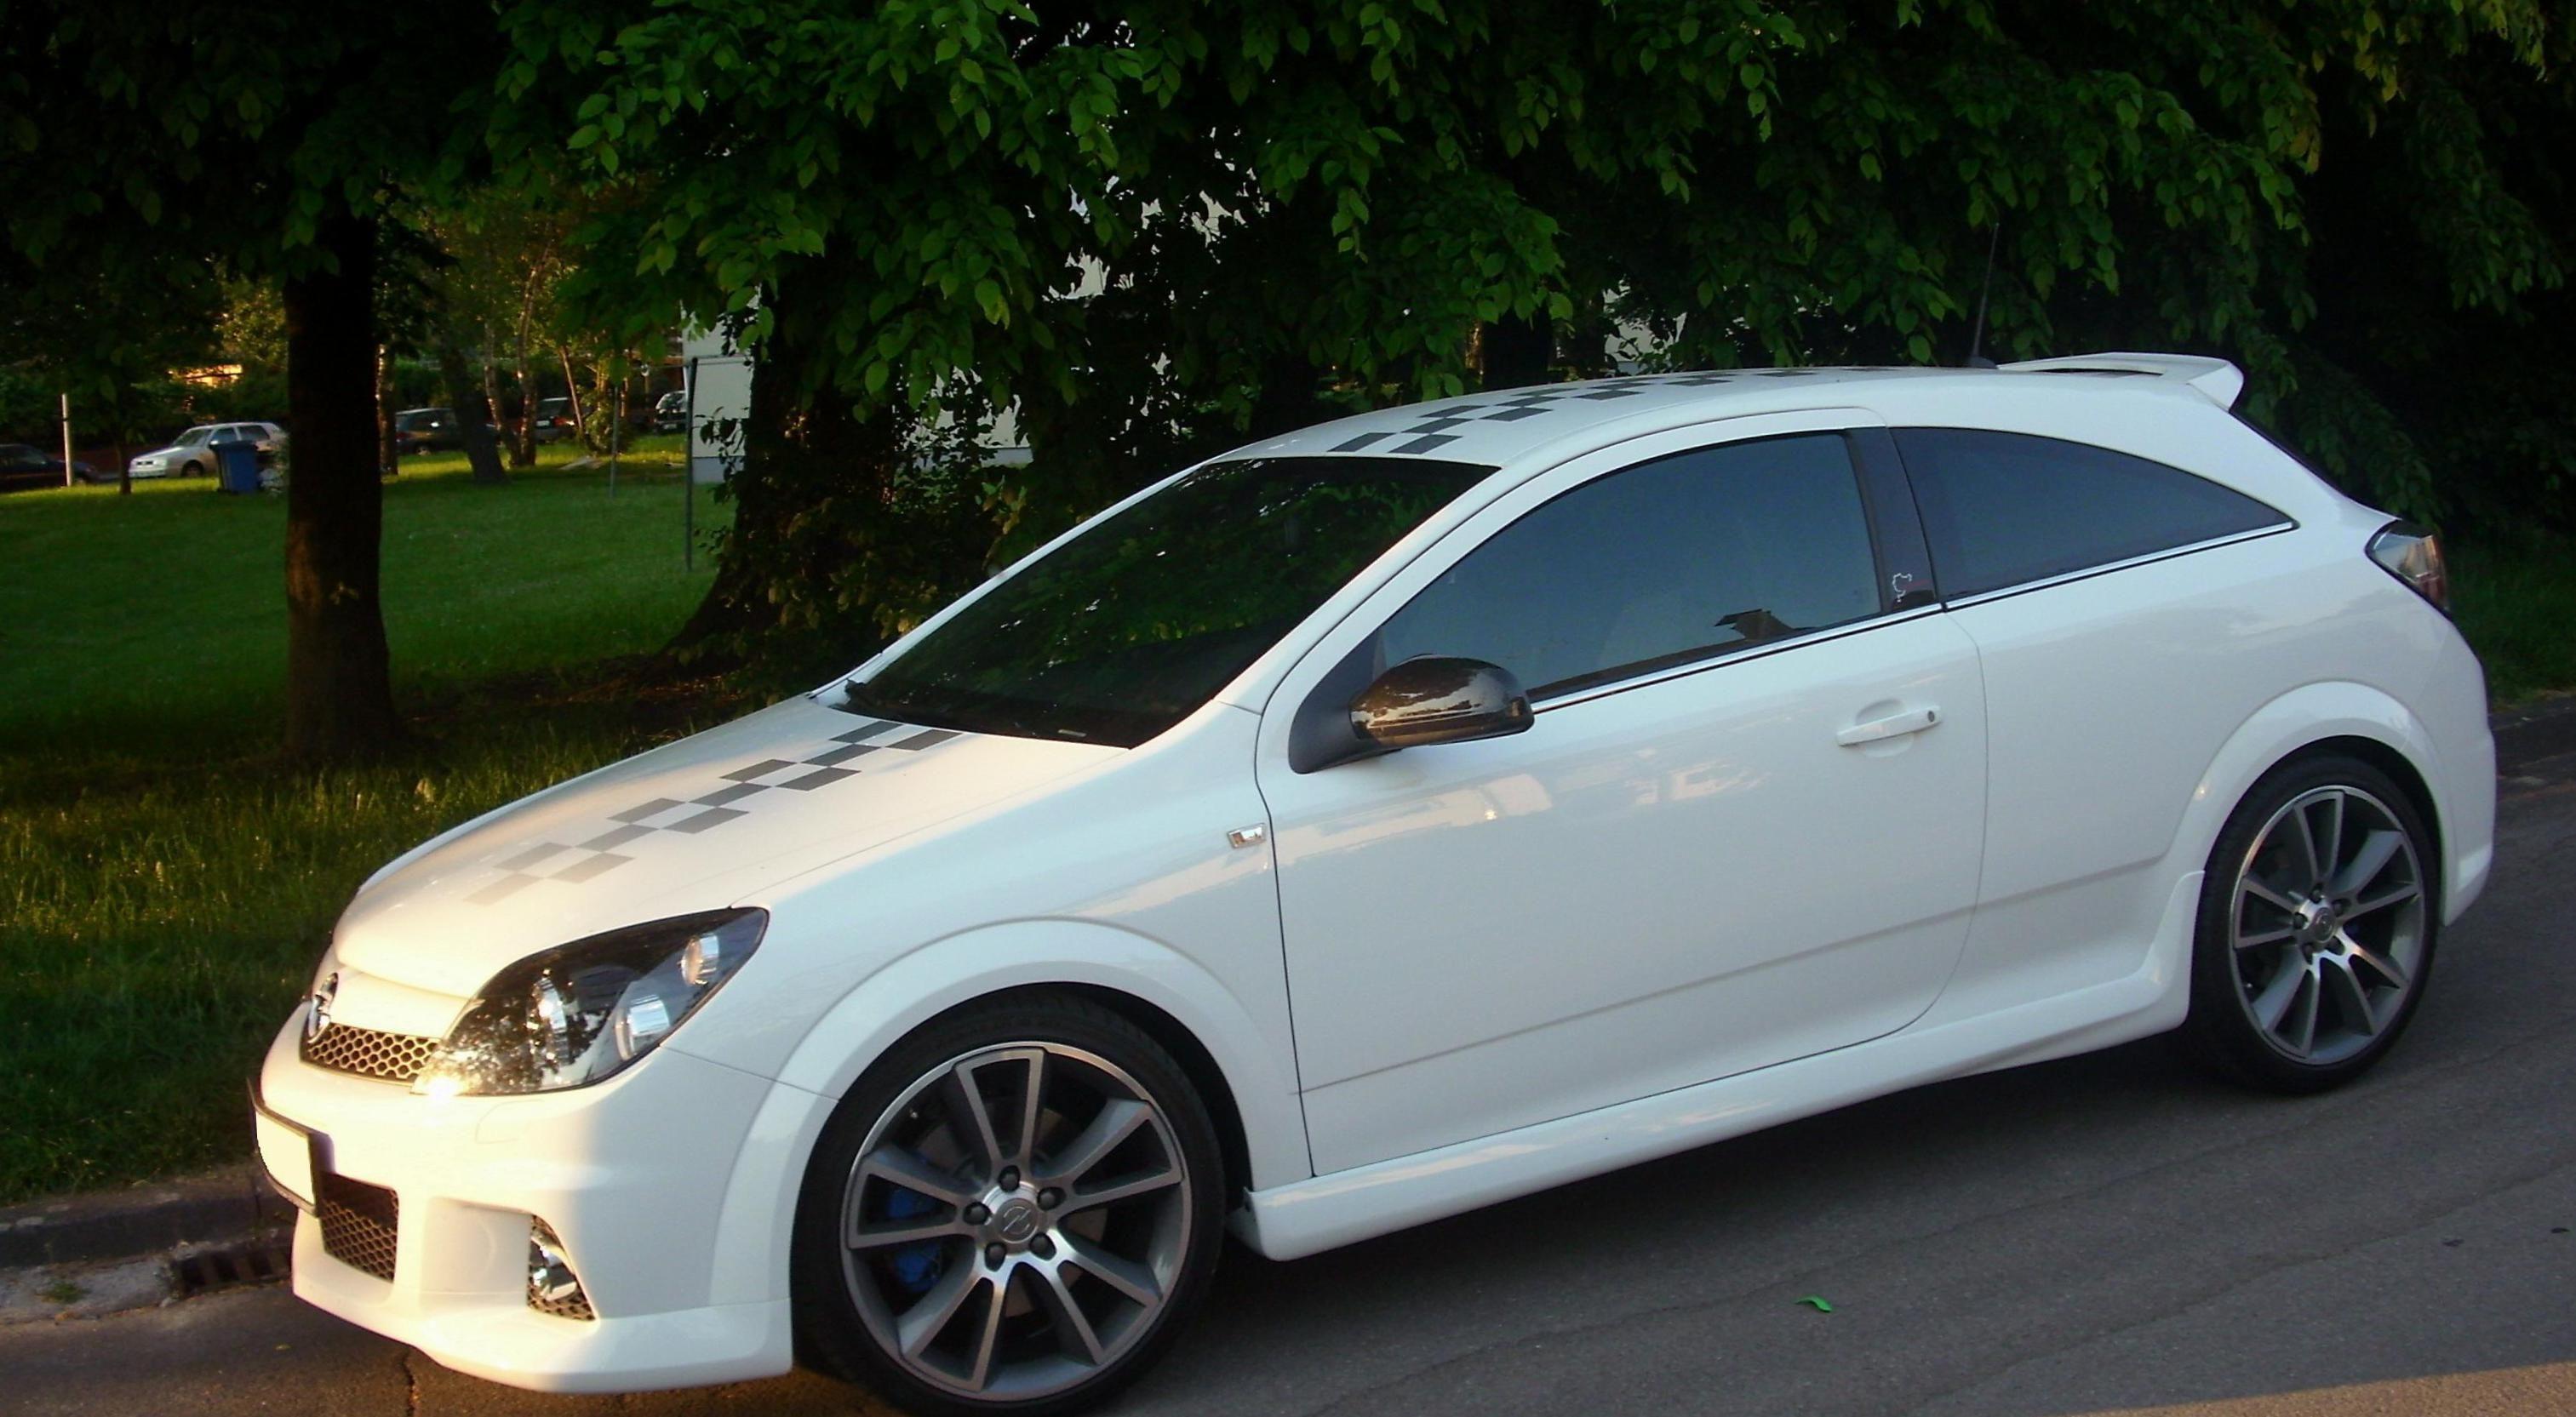 Opel Astra H Gtc Specification Http Autotras Com